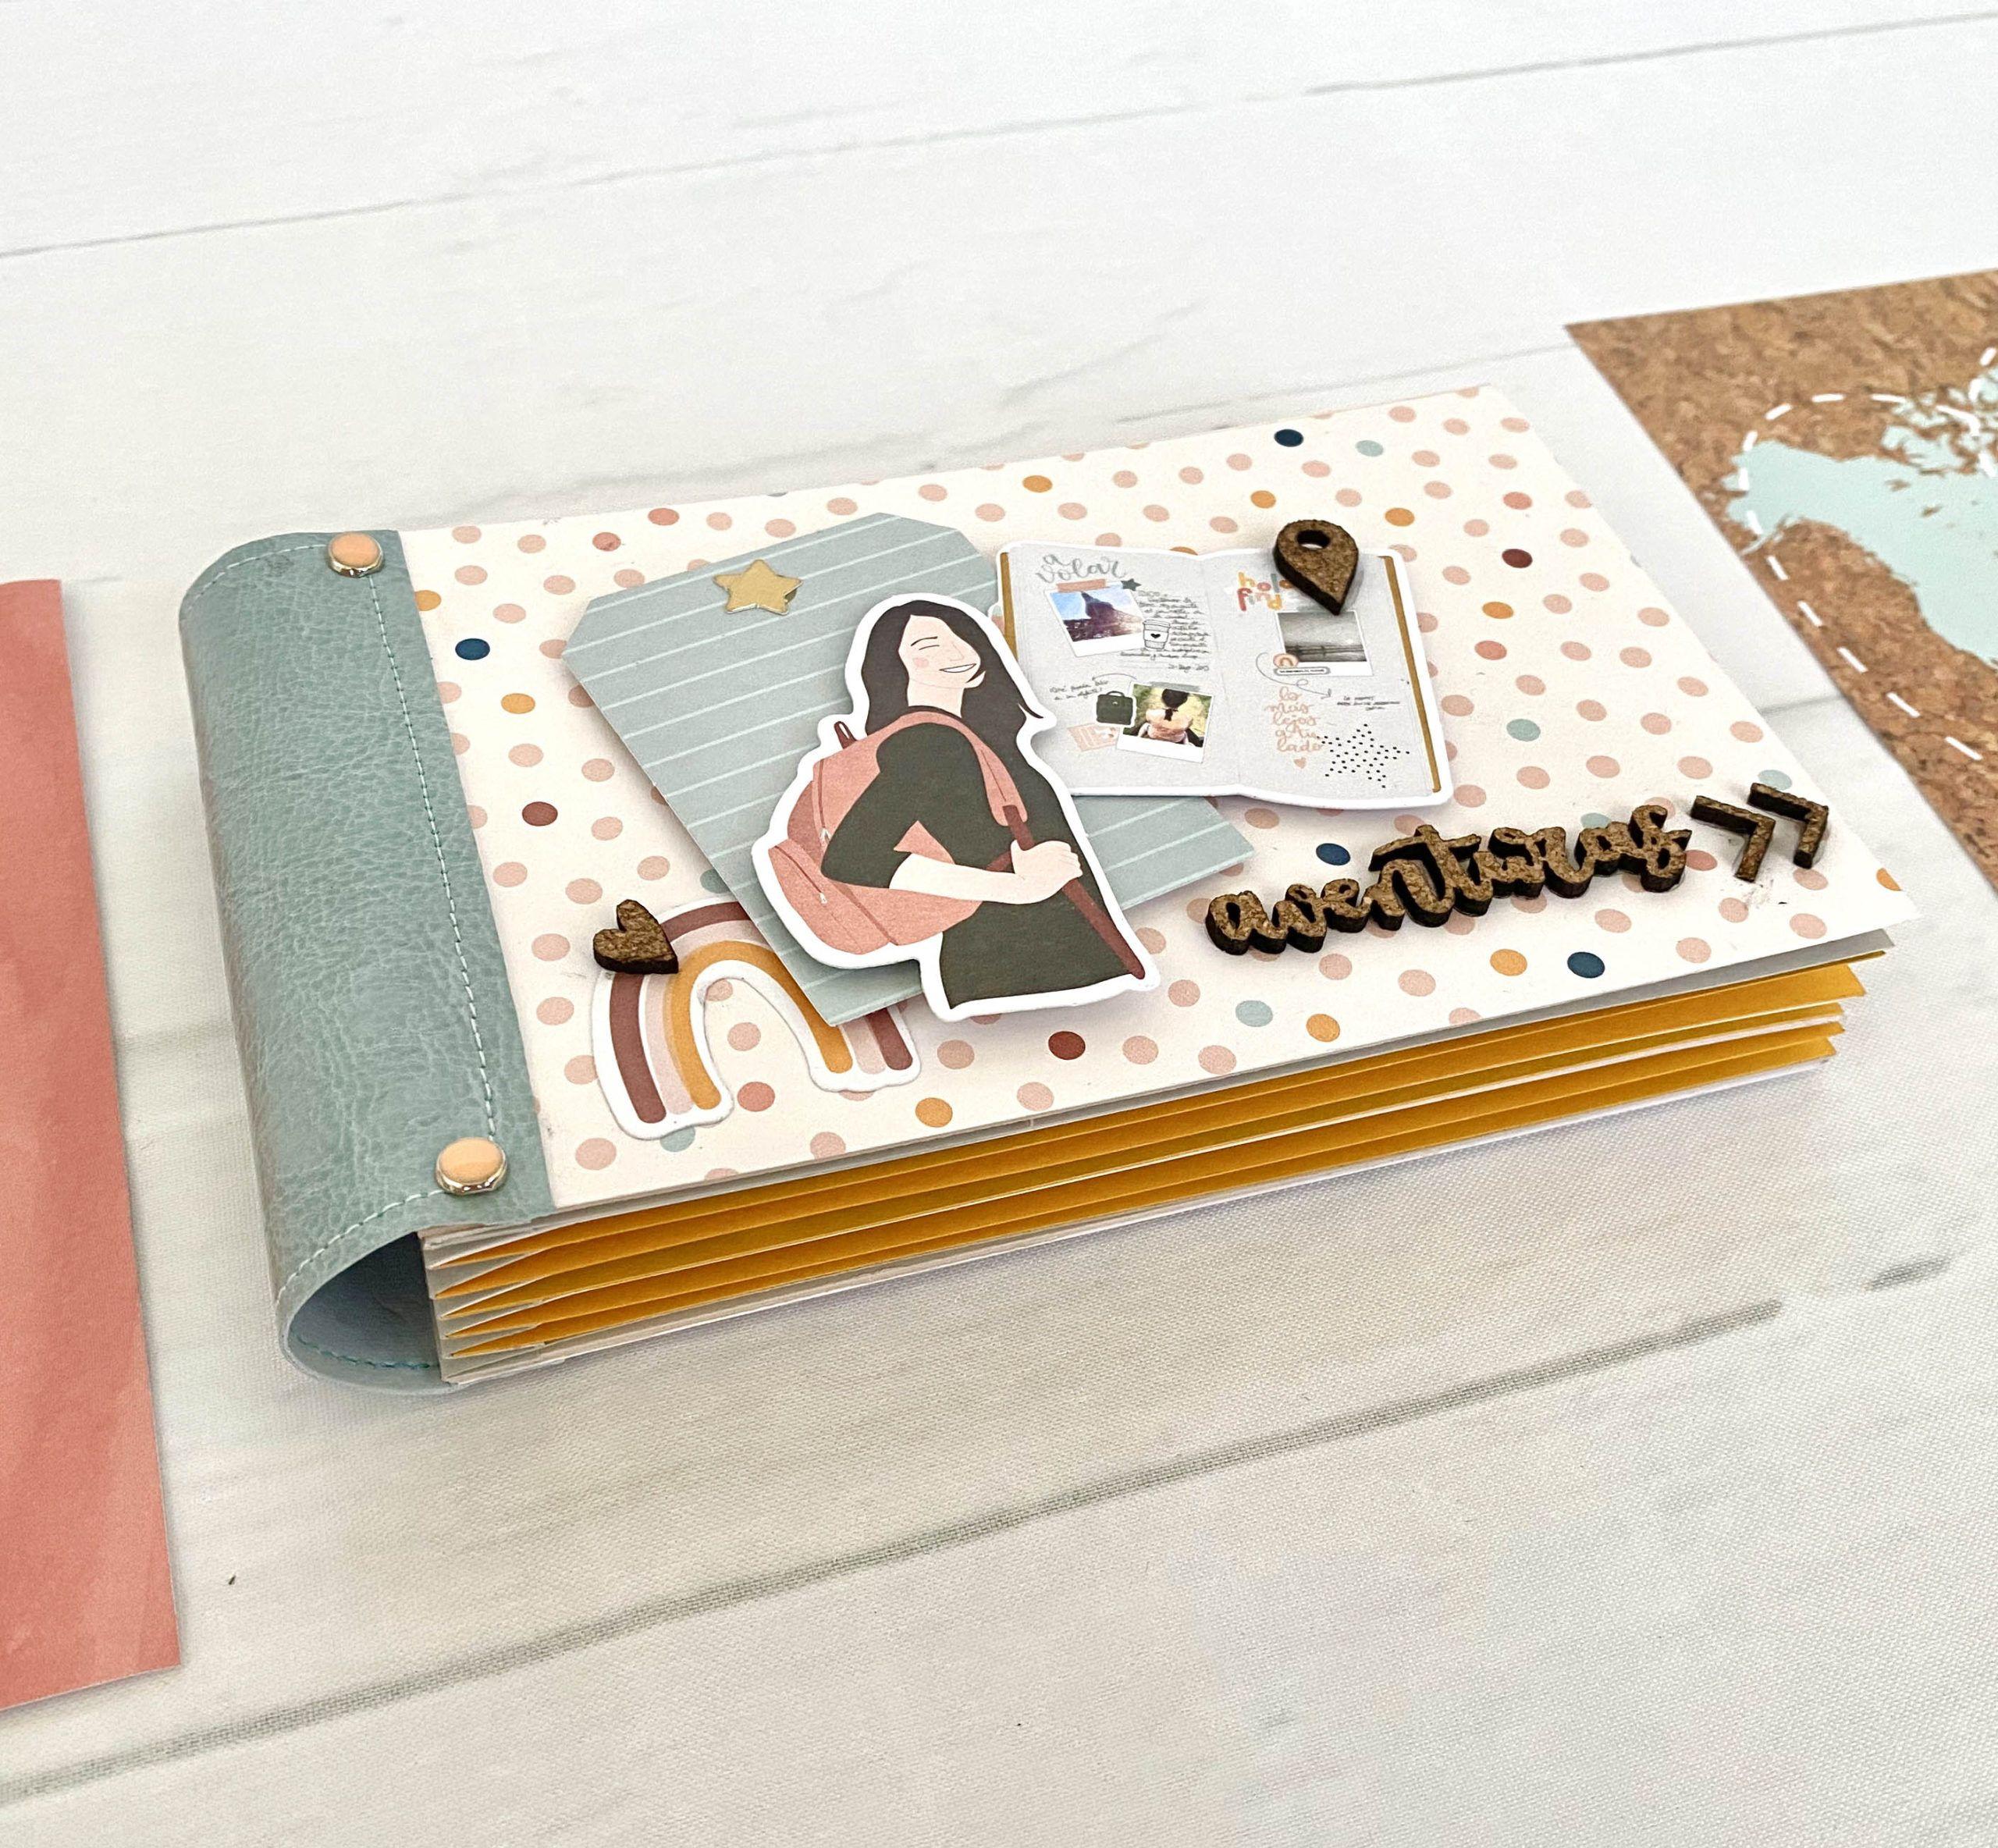 Álbum encuadernación acordeón con papelería scrapbook